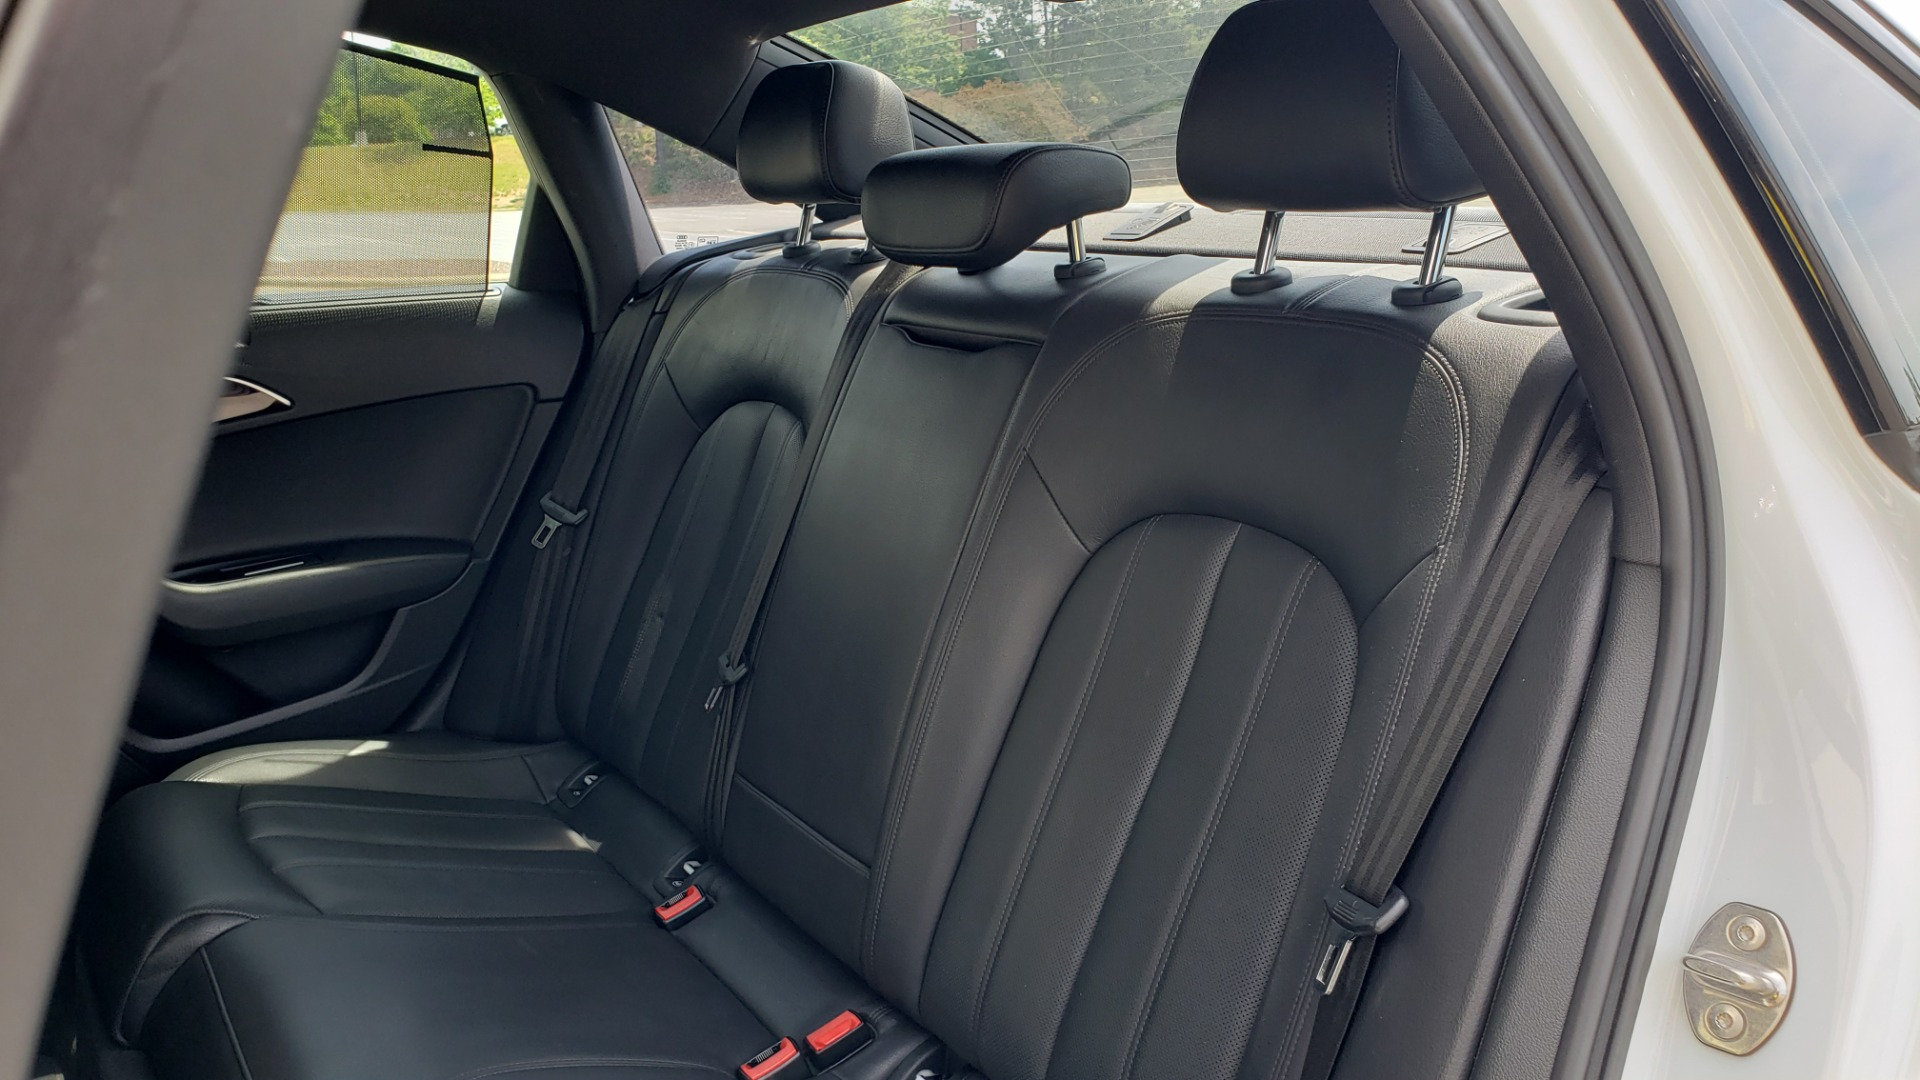 Used 2017 Audi A6 PRESTIGE SEDAN 3.0T / NAV / SUNROOF / BLACK OPTIC / CLD WTHR / REARVIEW for sale $30,797 at Formula Imports in Charlotte NC 28227 68